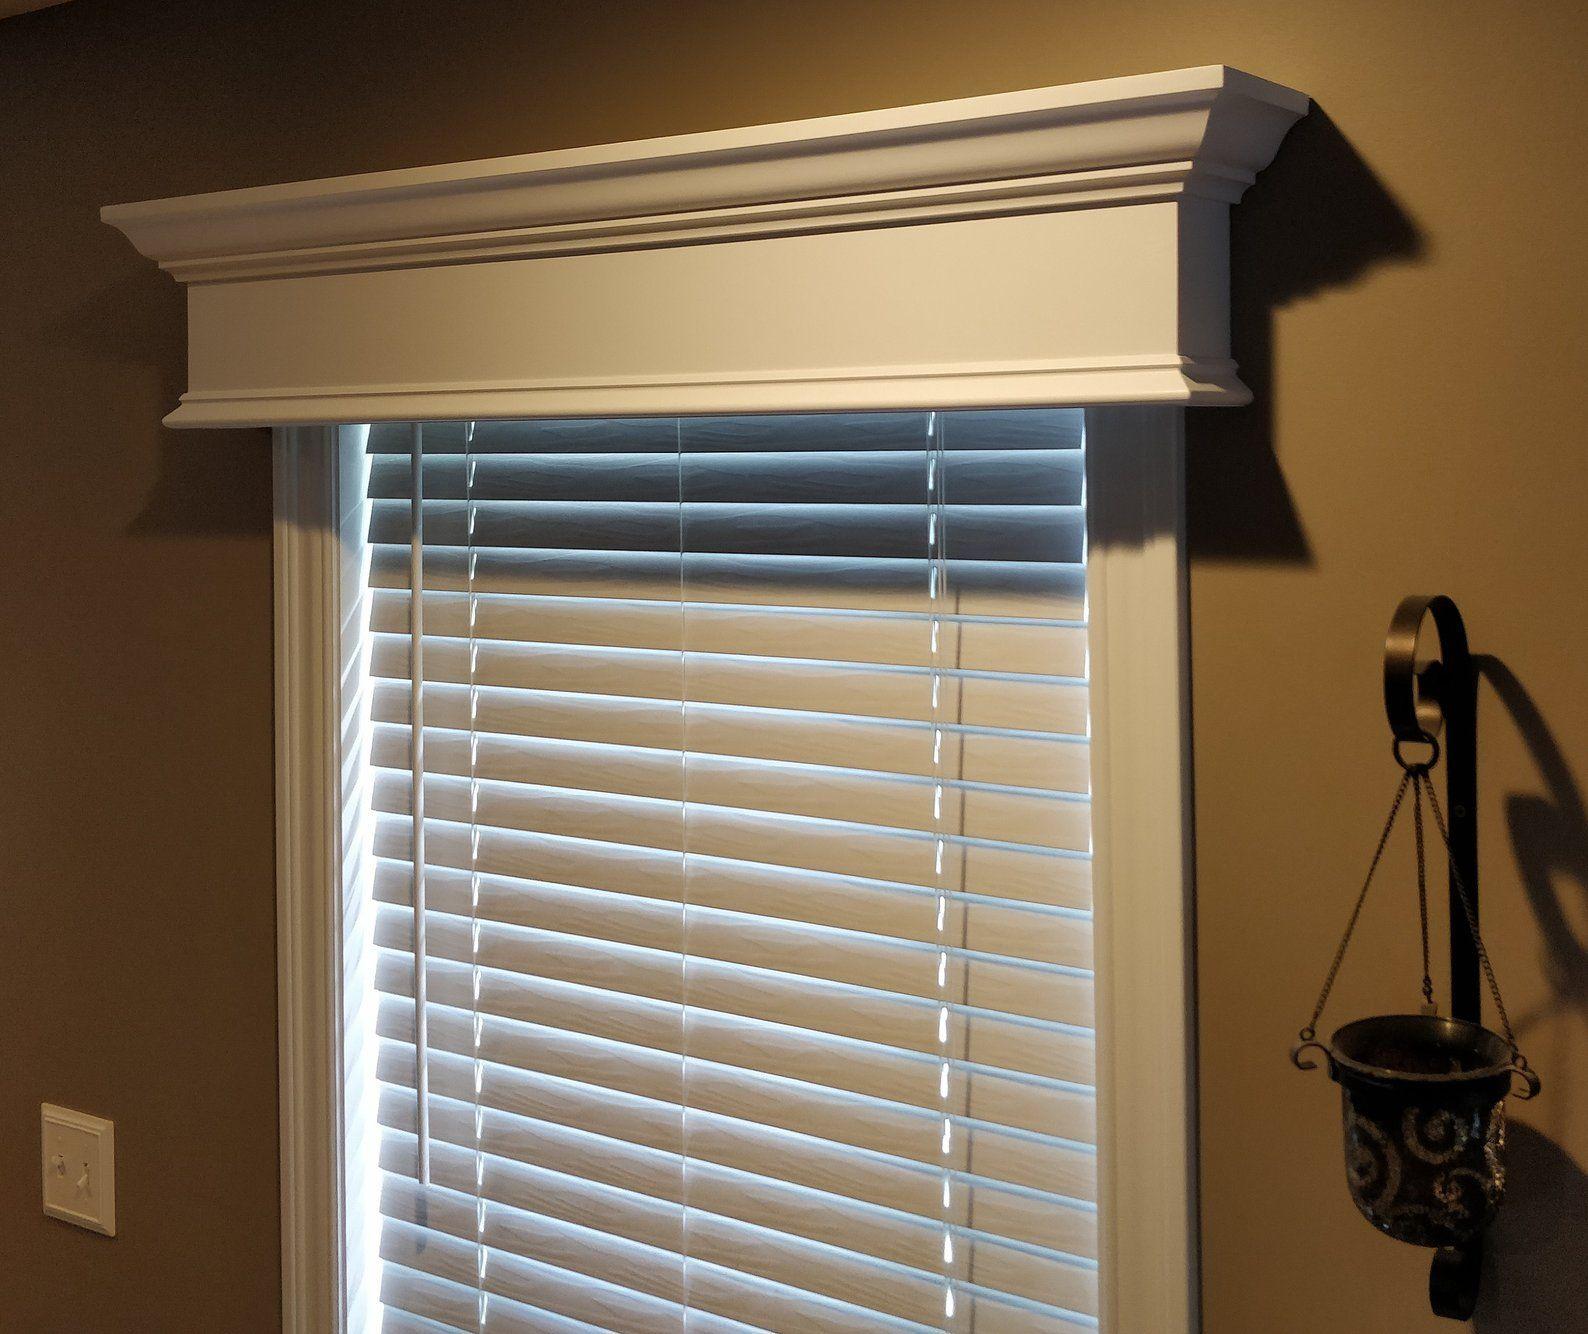 Wood Cornice Board Etsy Wood Cornice Patio Door Coverings Door Coverings